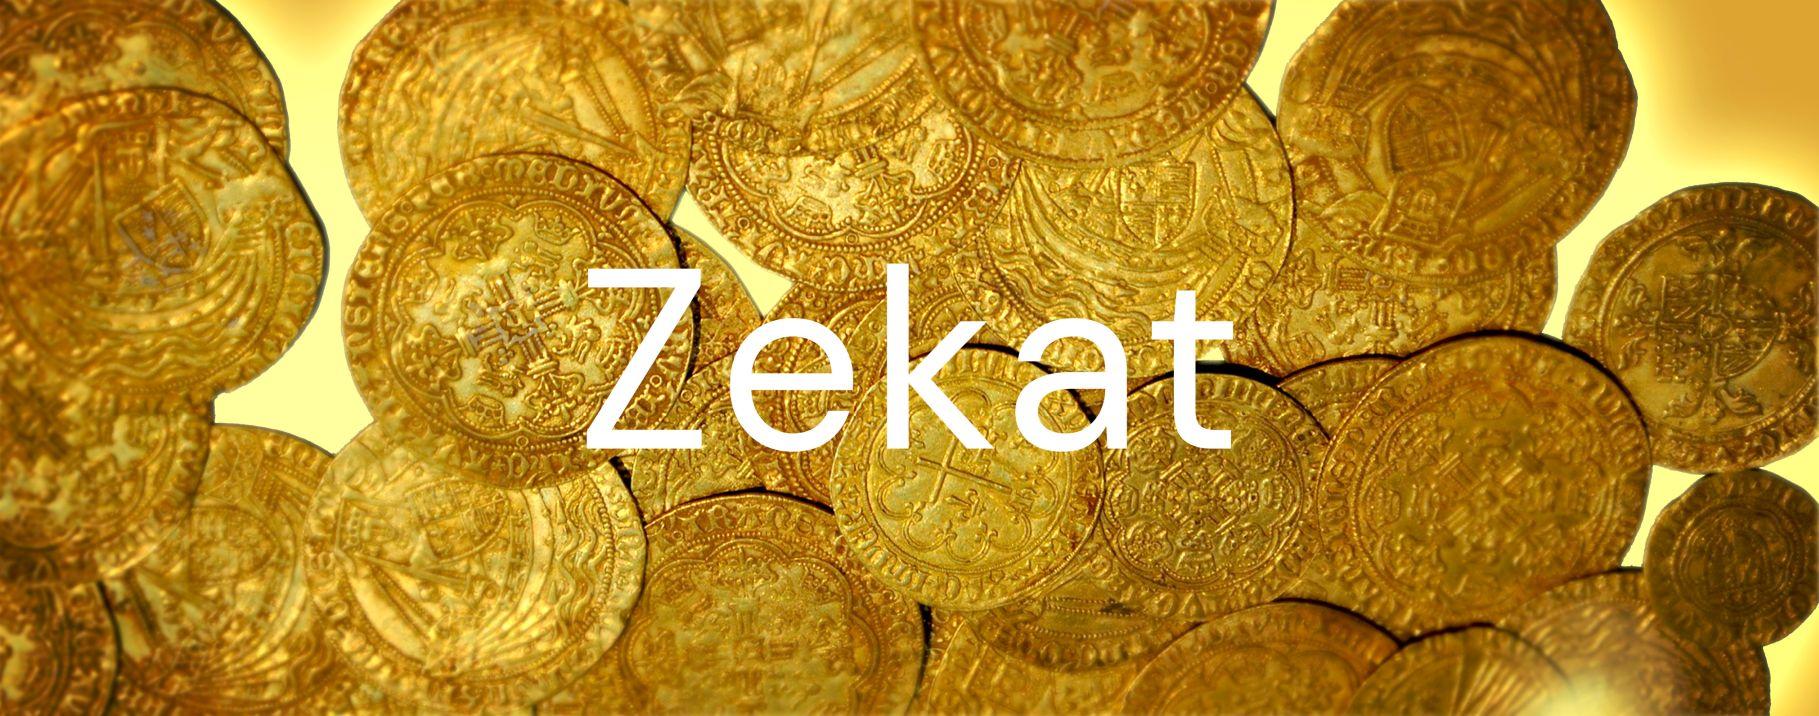 Sustav Zekata u islamu